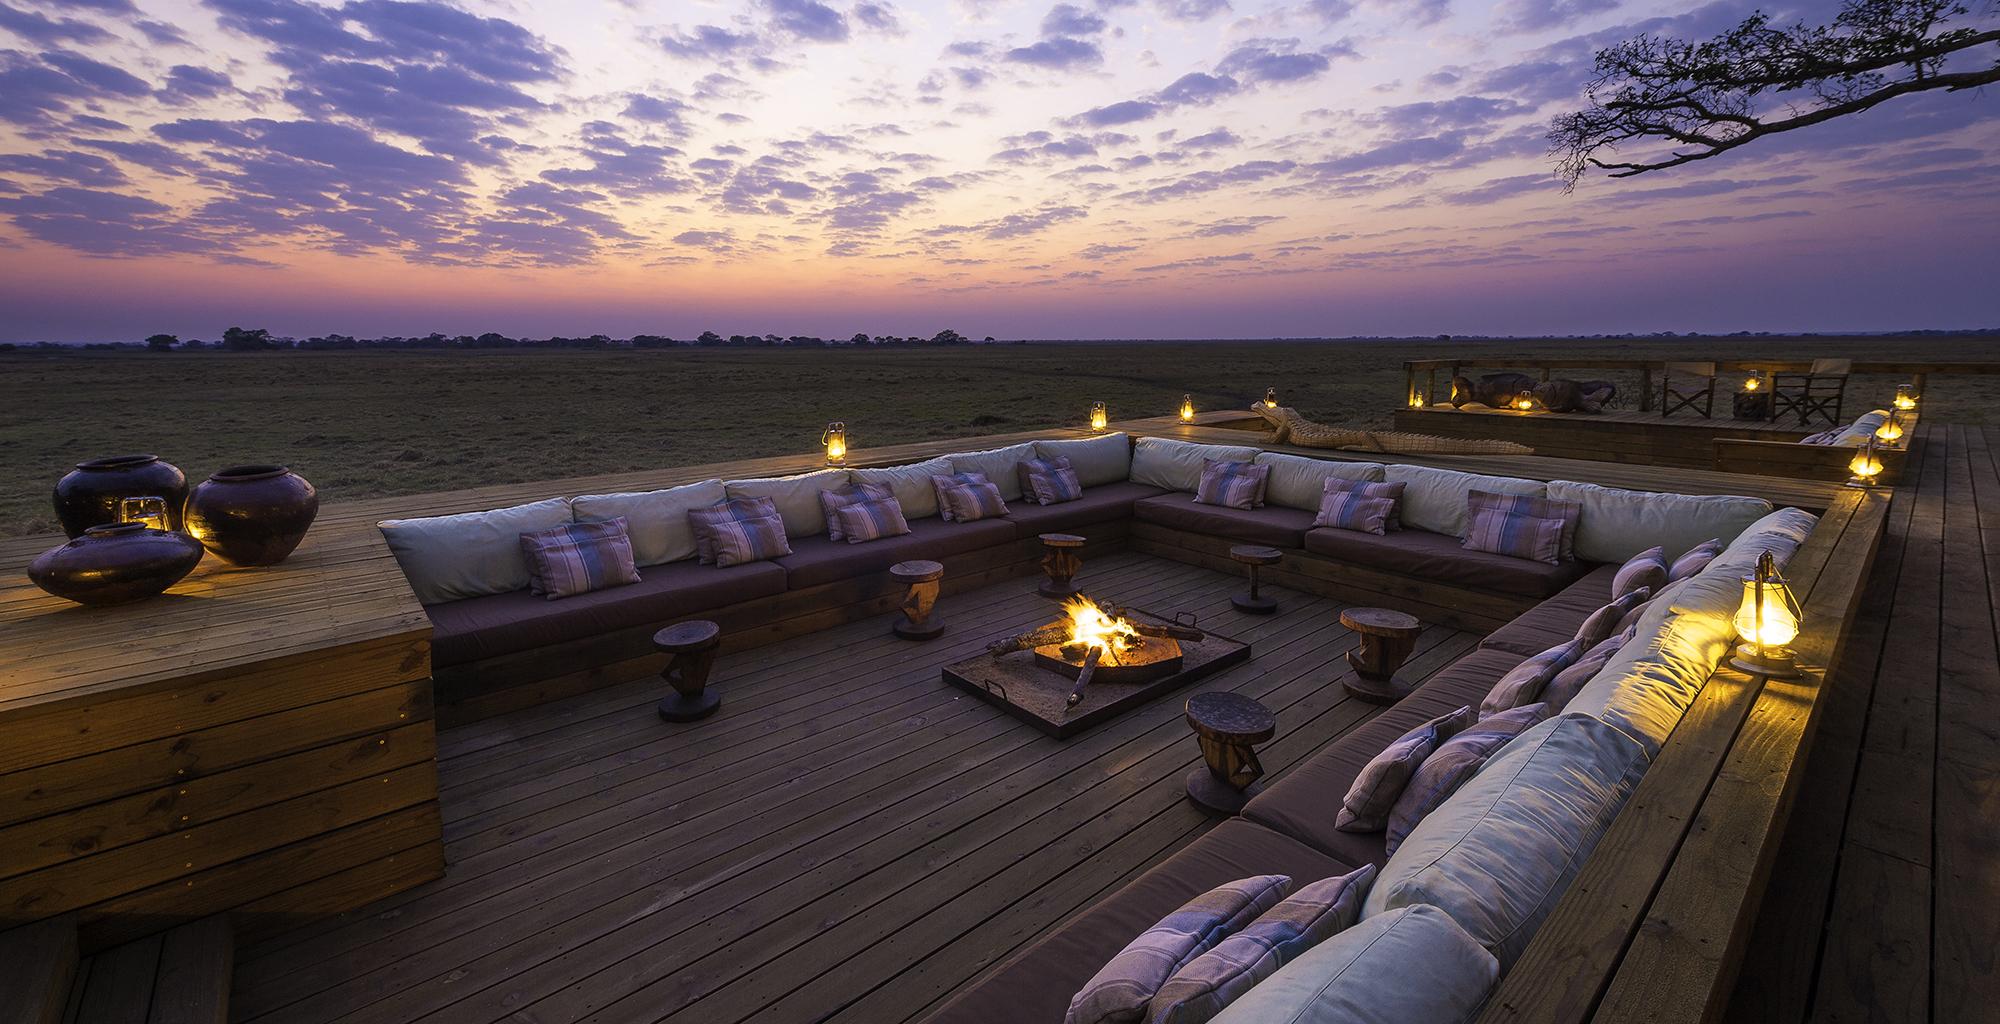 Zambia-Shumba-Camp-Deck